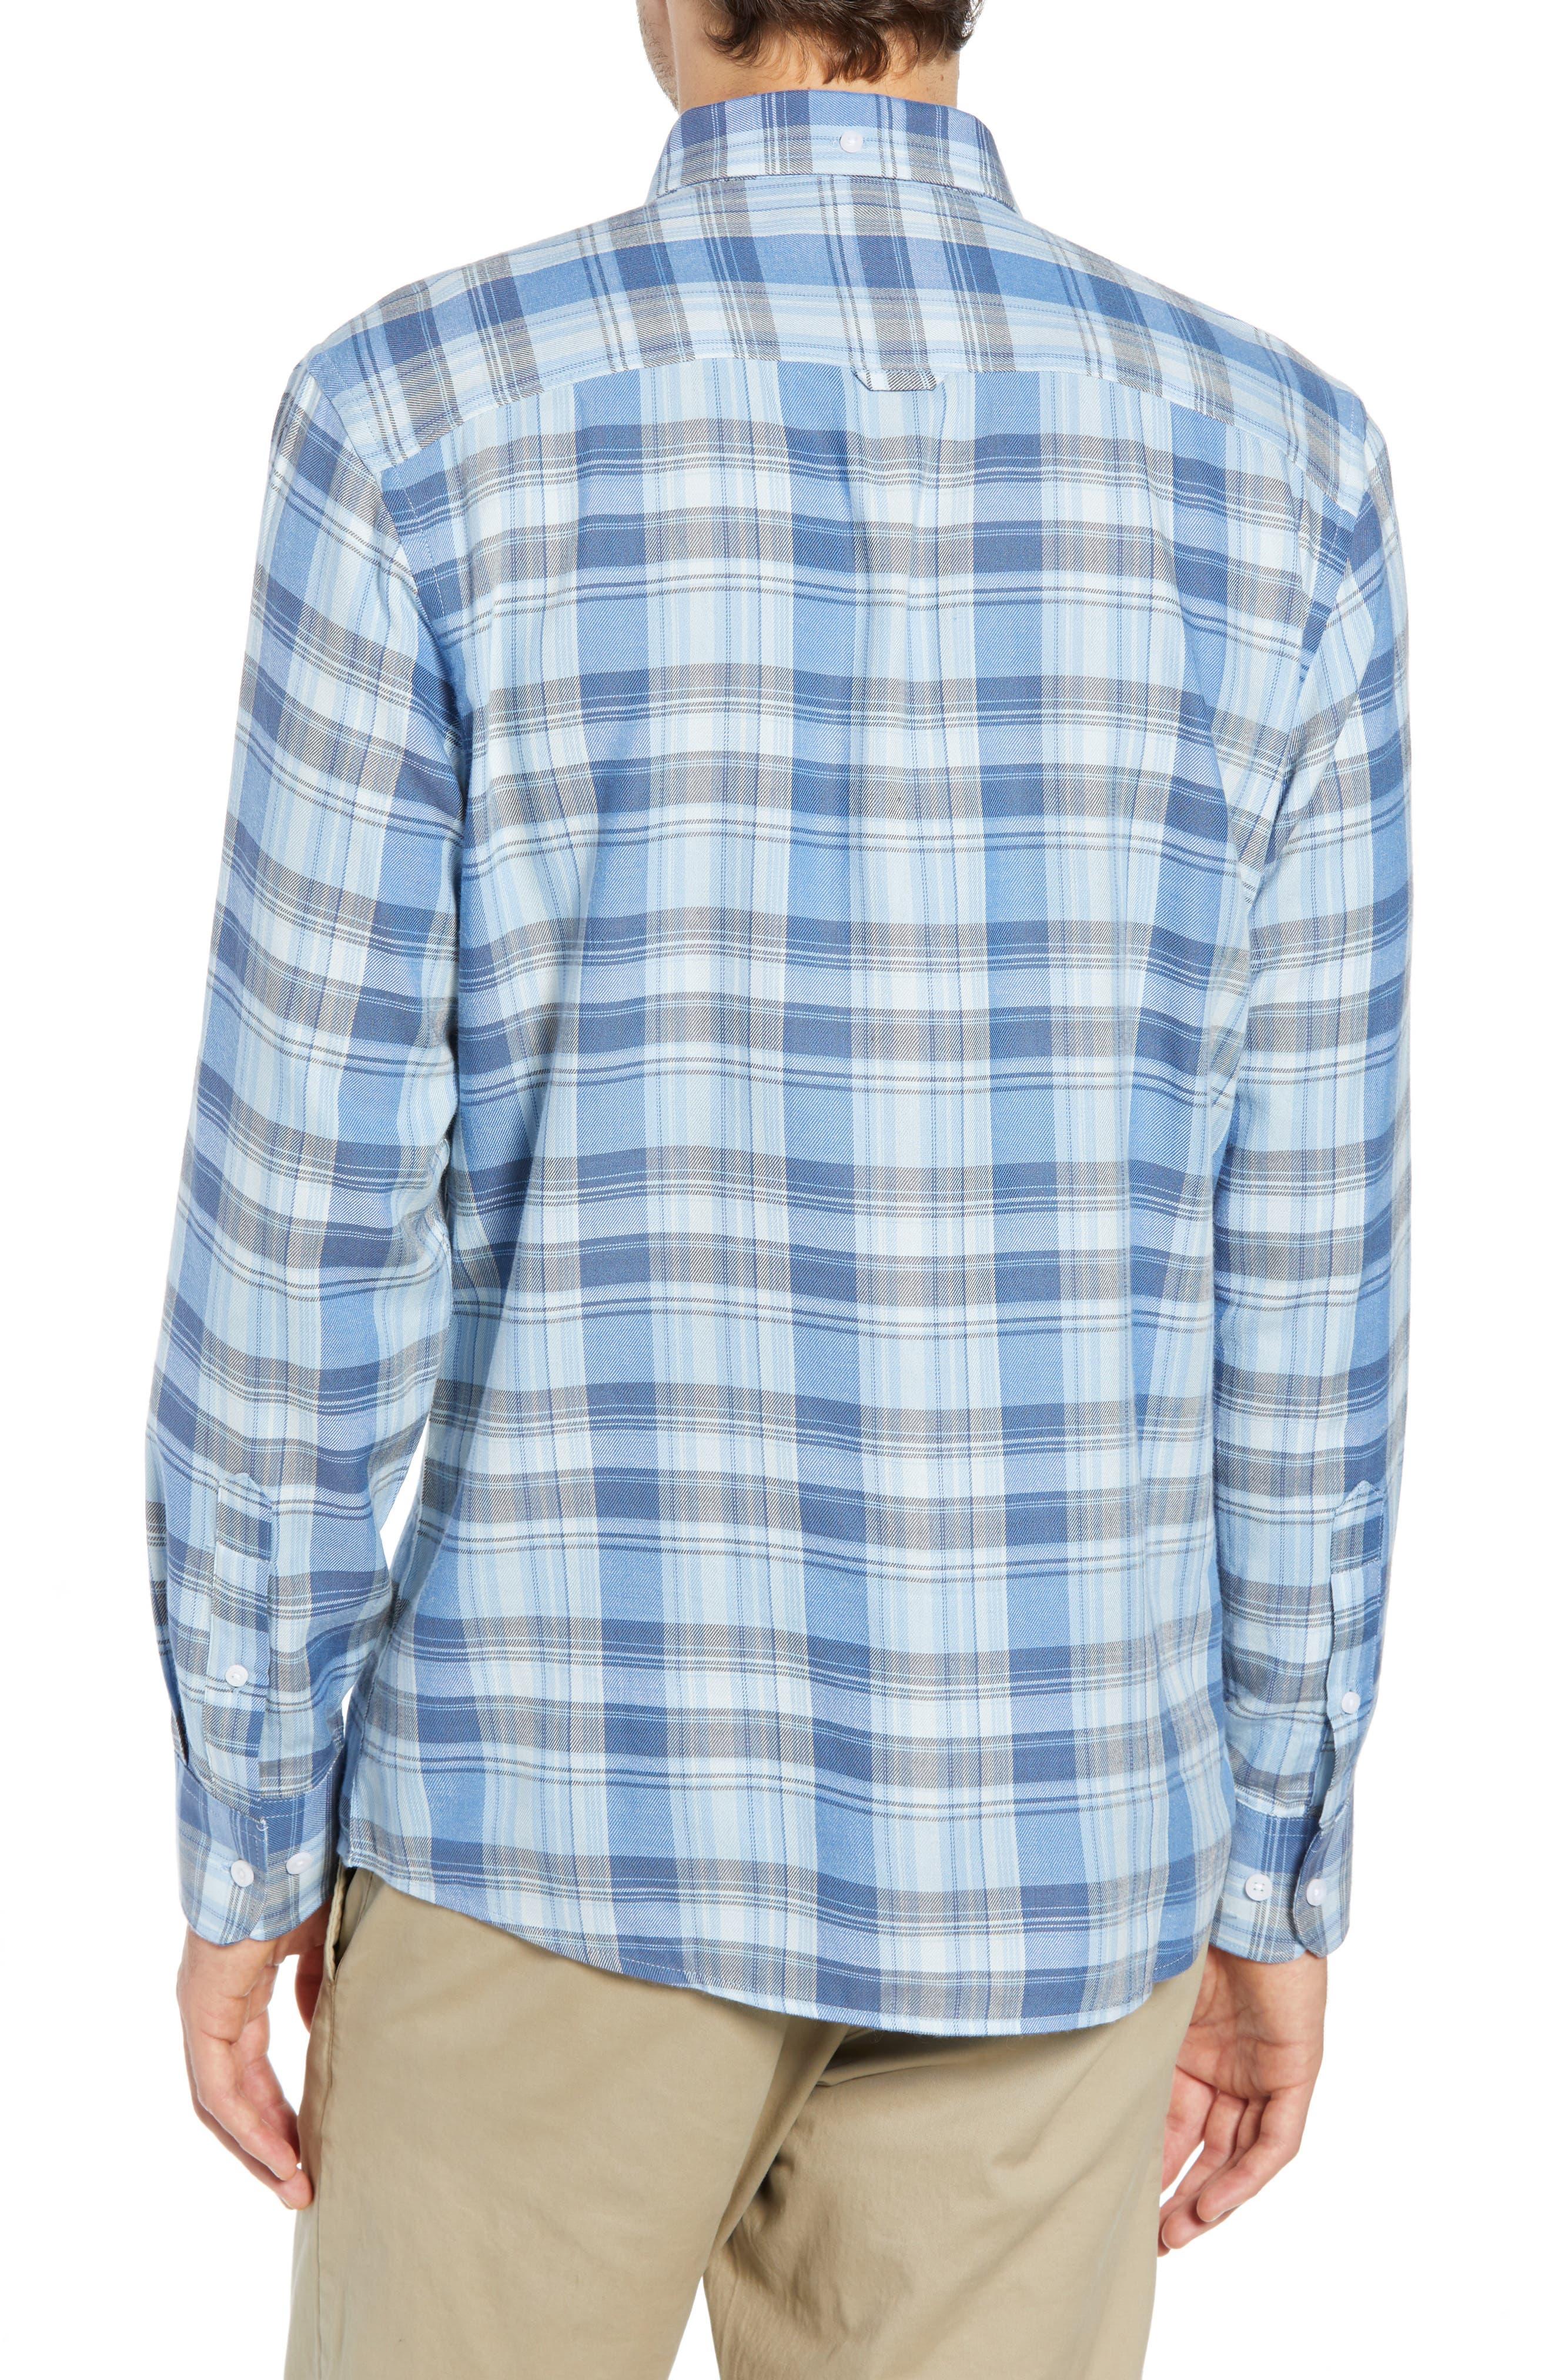 Slim Fit Plaid Sport Shirt,                             Alternate thumbnail 3, color,                             BLUE CHAMBRAY BLUE DARK PLAID